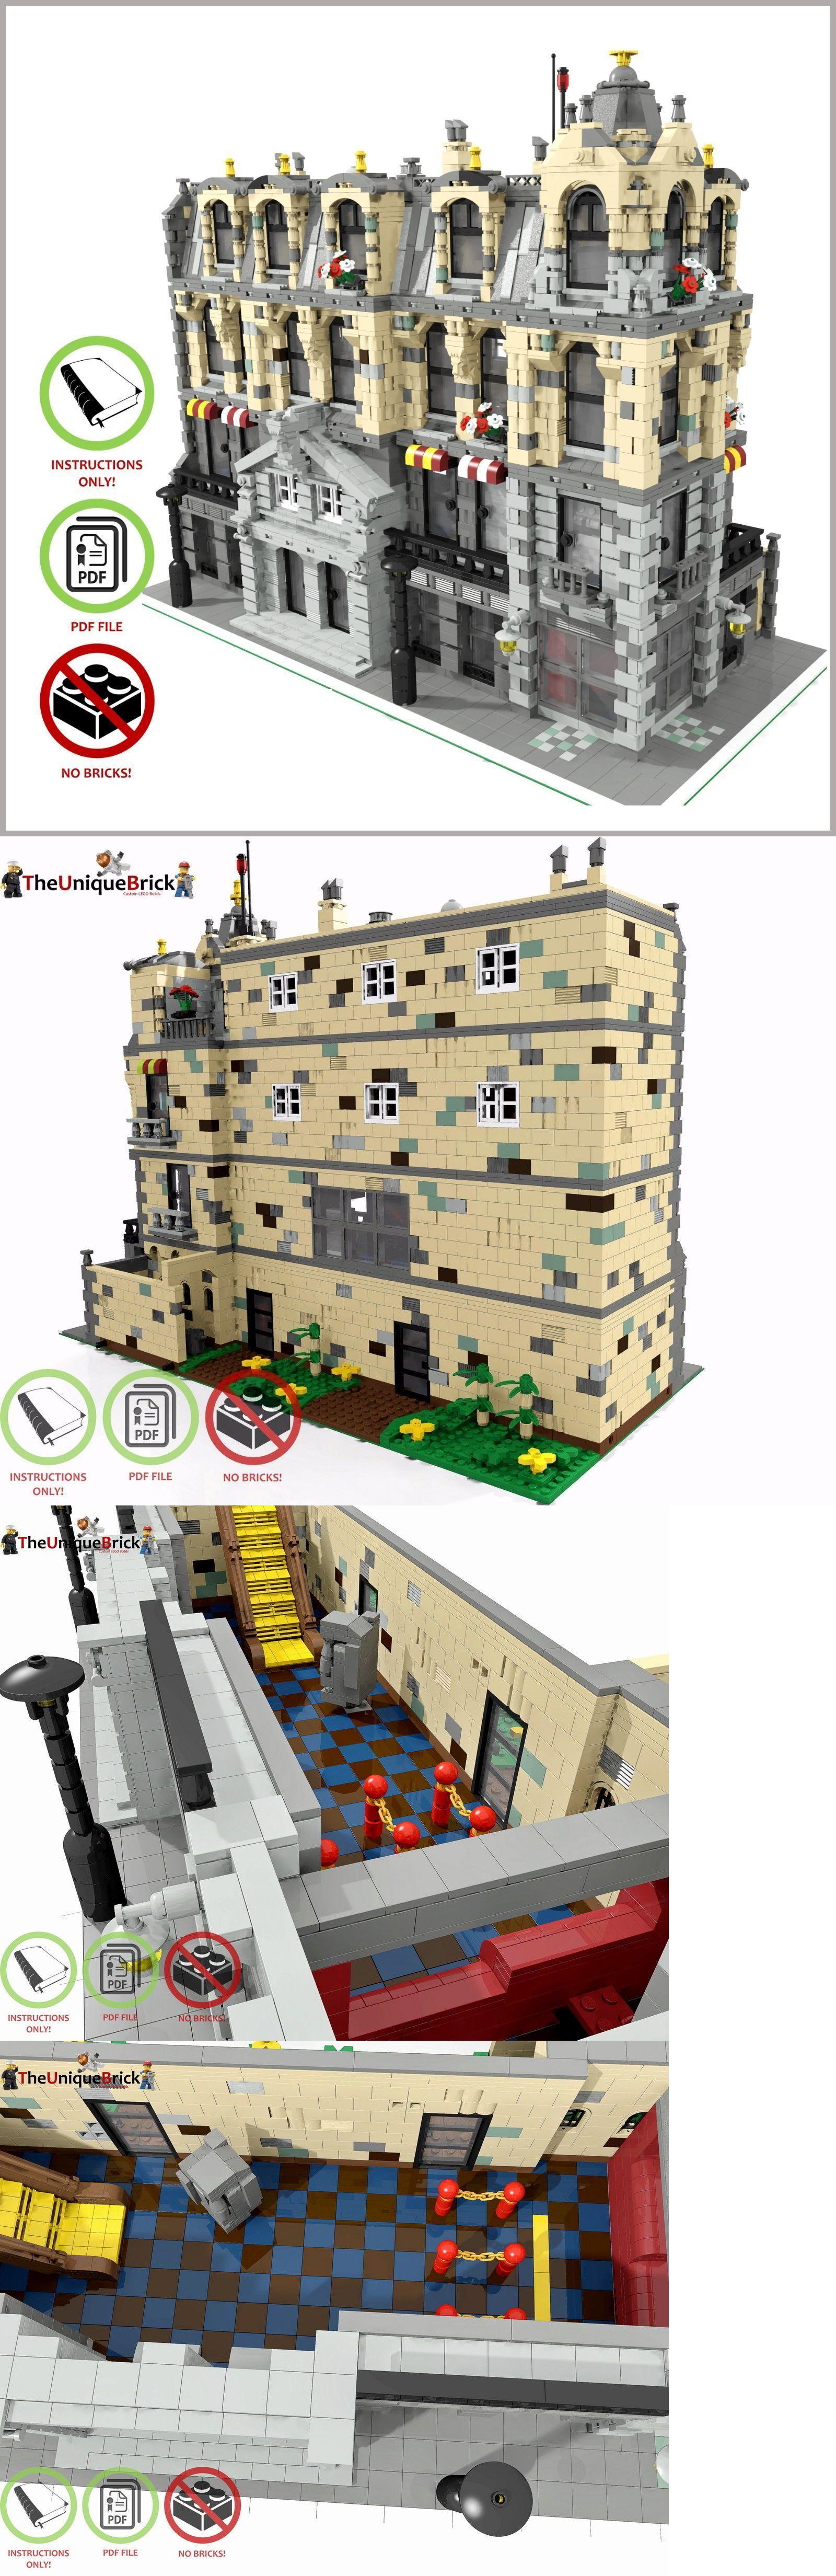 Lego Instruction Manuals 183449 Lego Moc Modular Town City Hall Custom Model Pdf Instructions Manual Buy It Now Only Lego Cool Lego Creations Lego Moc